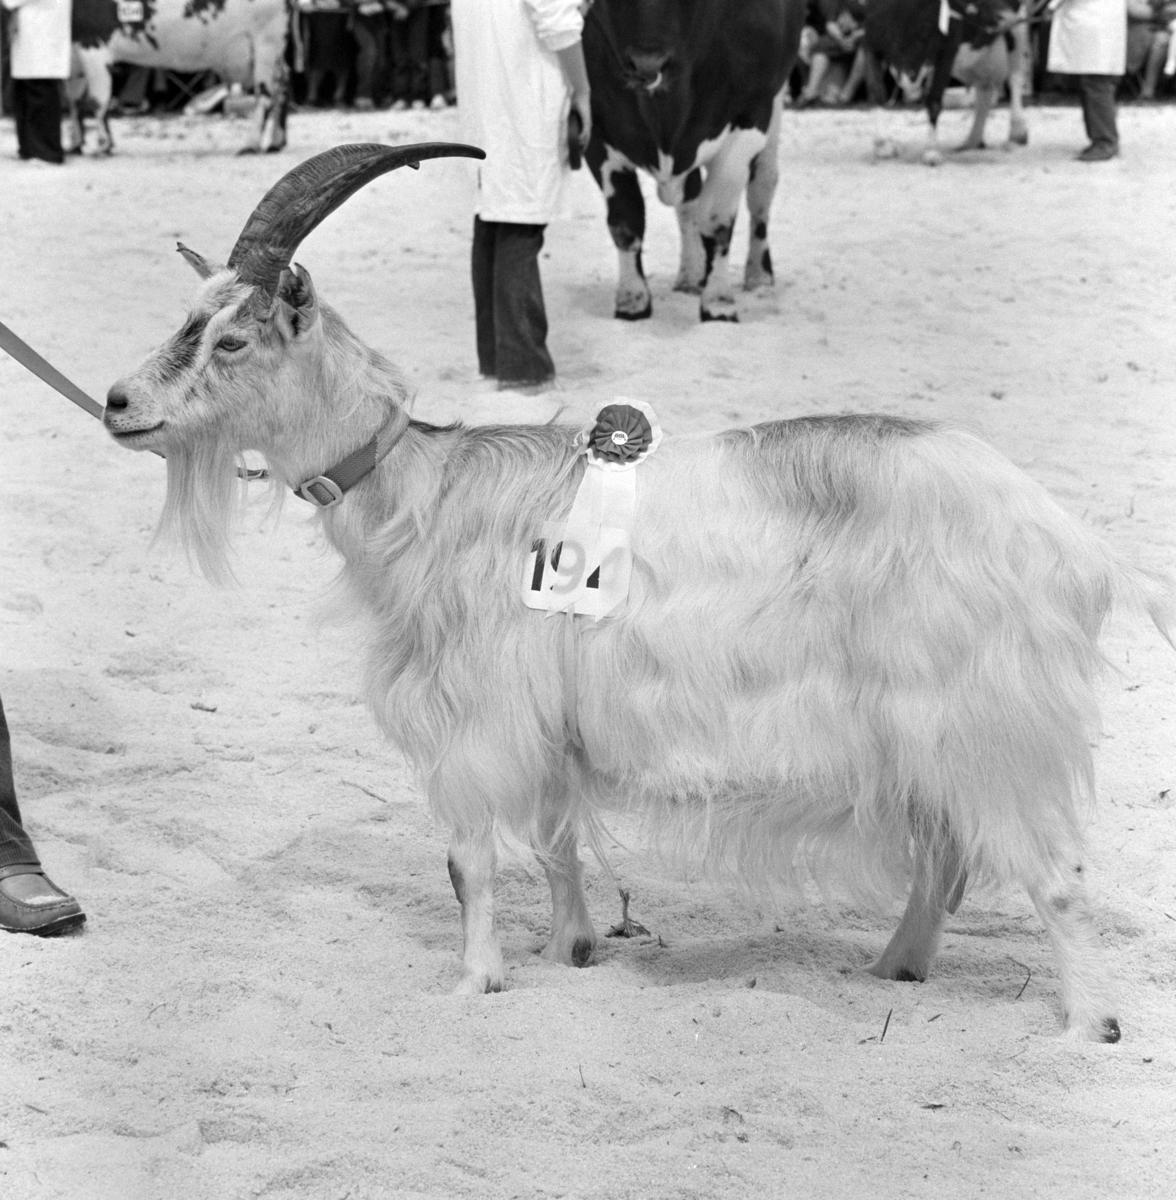 Norske Melkeprodusenters Landsforbund, NML 100 år 1881-1981. Jubileumsutstilling,visningsring, kavalkade over norsk husdyrhold, geitbukk, Domkirkeodden, Hamar.